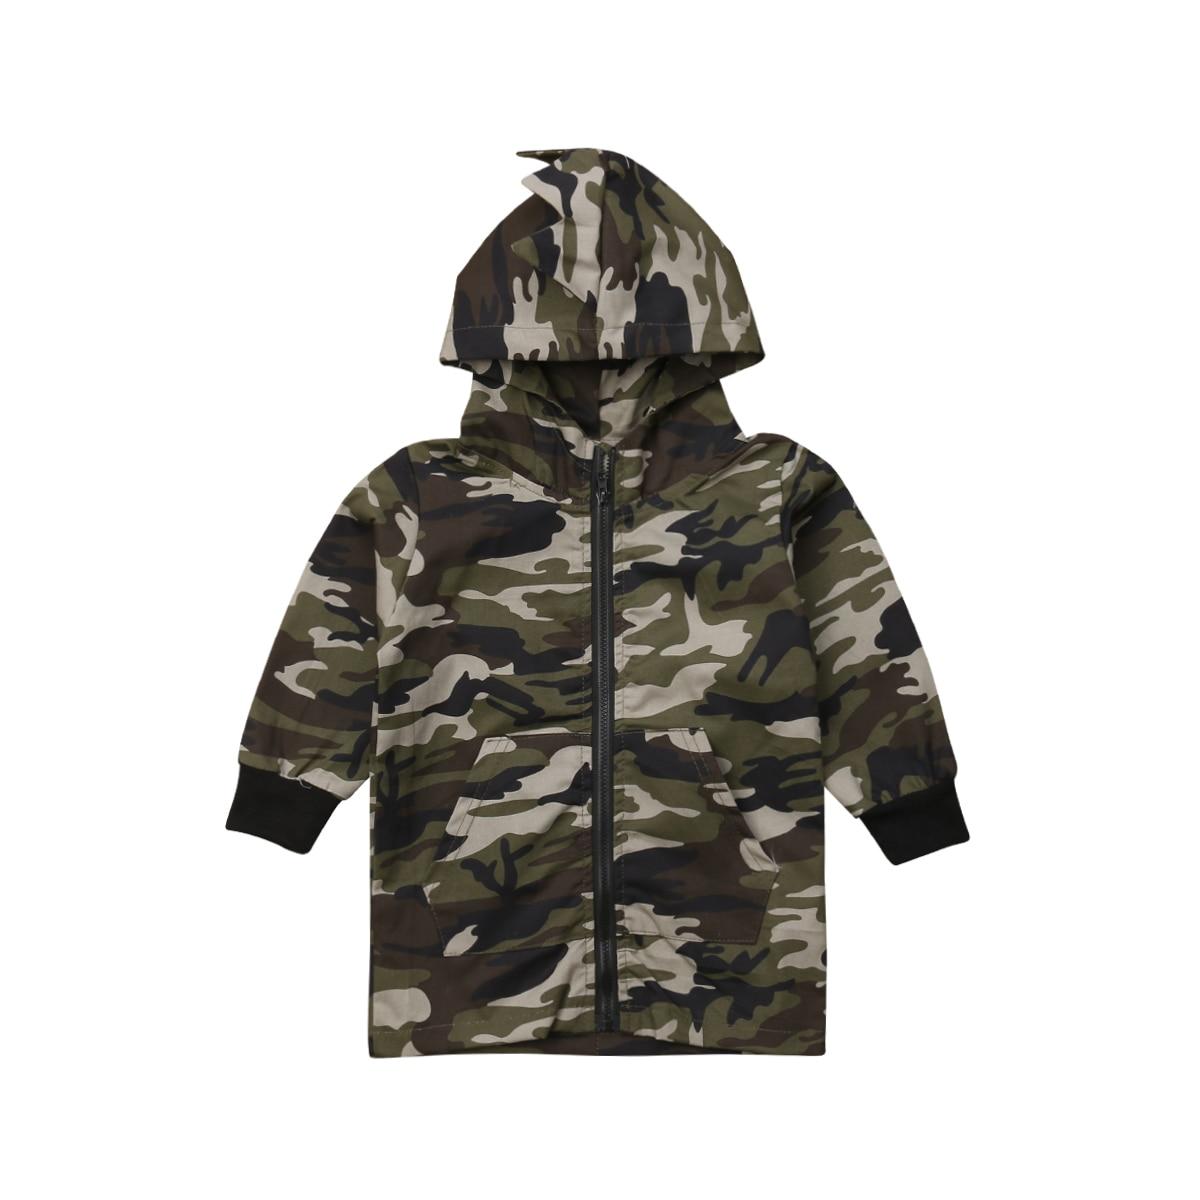 Fashion Toddler Coat Outwear Winter Autumn Kid Boy Camouflage Jackets Dinosaur Zipper Coat Top Hooded Outwear Hoodies